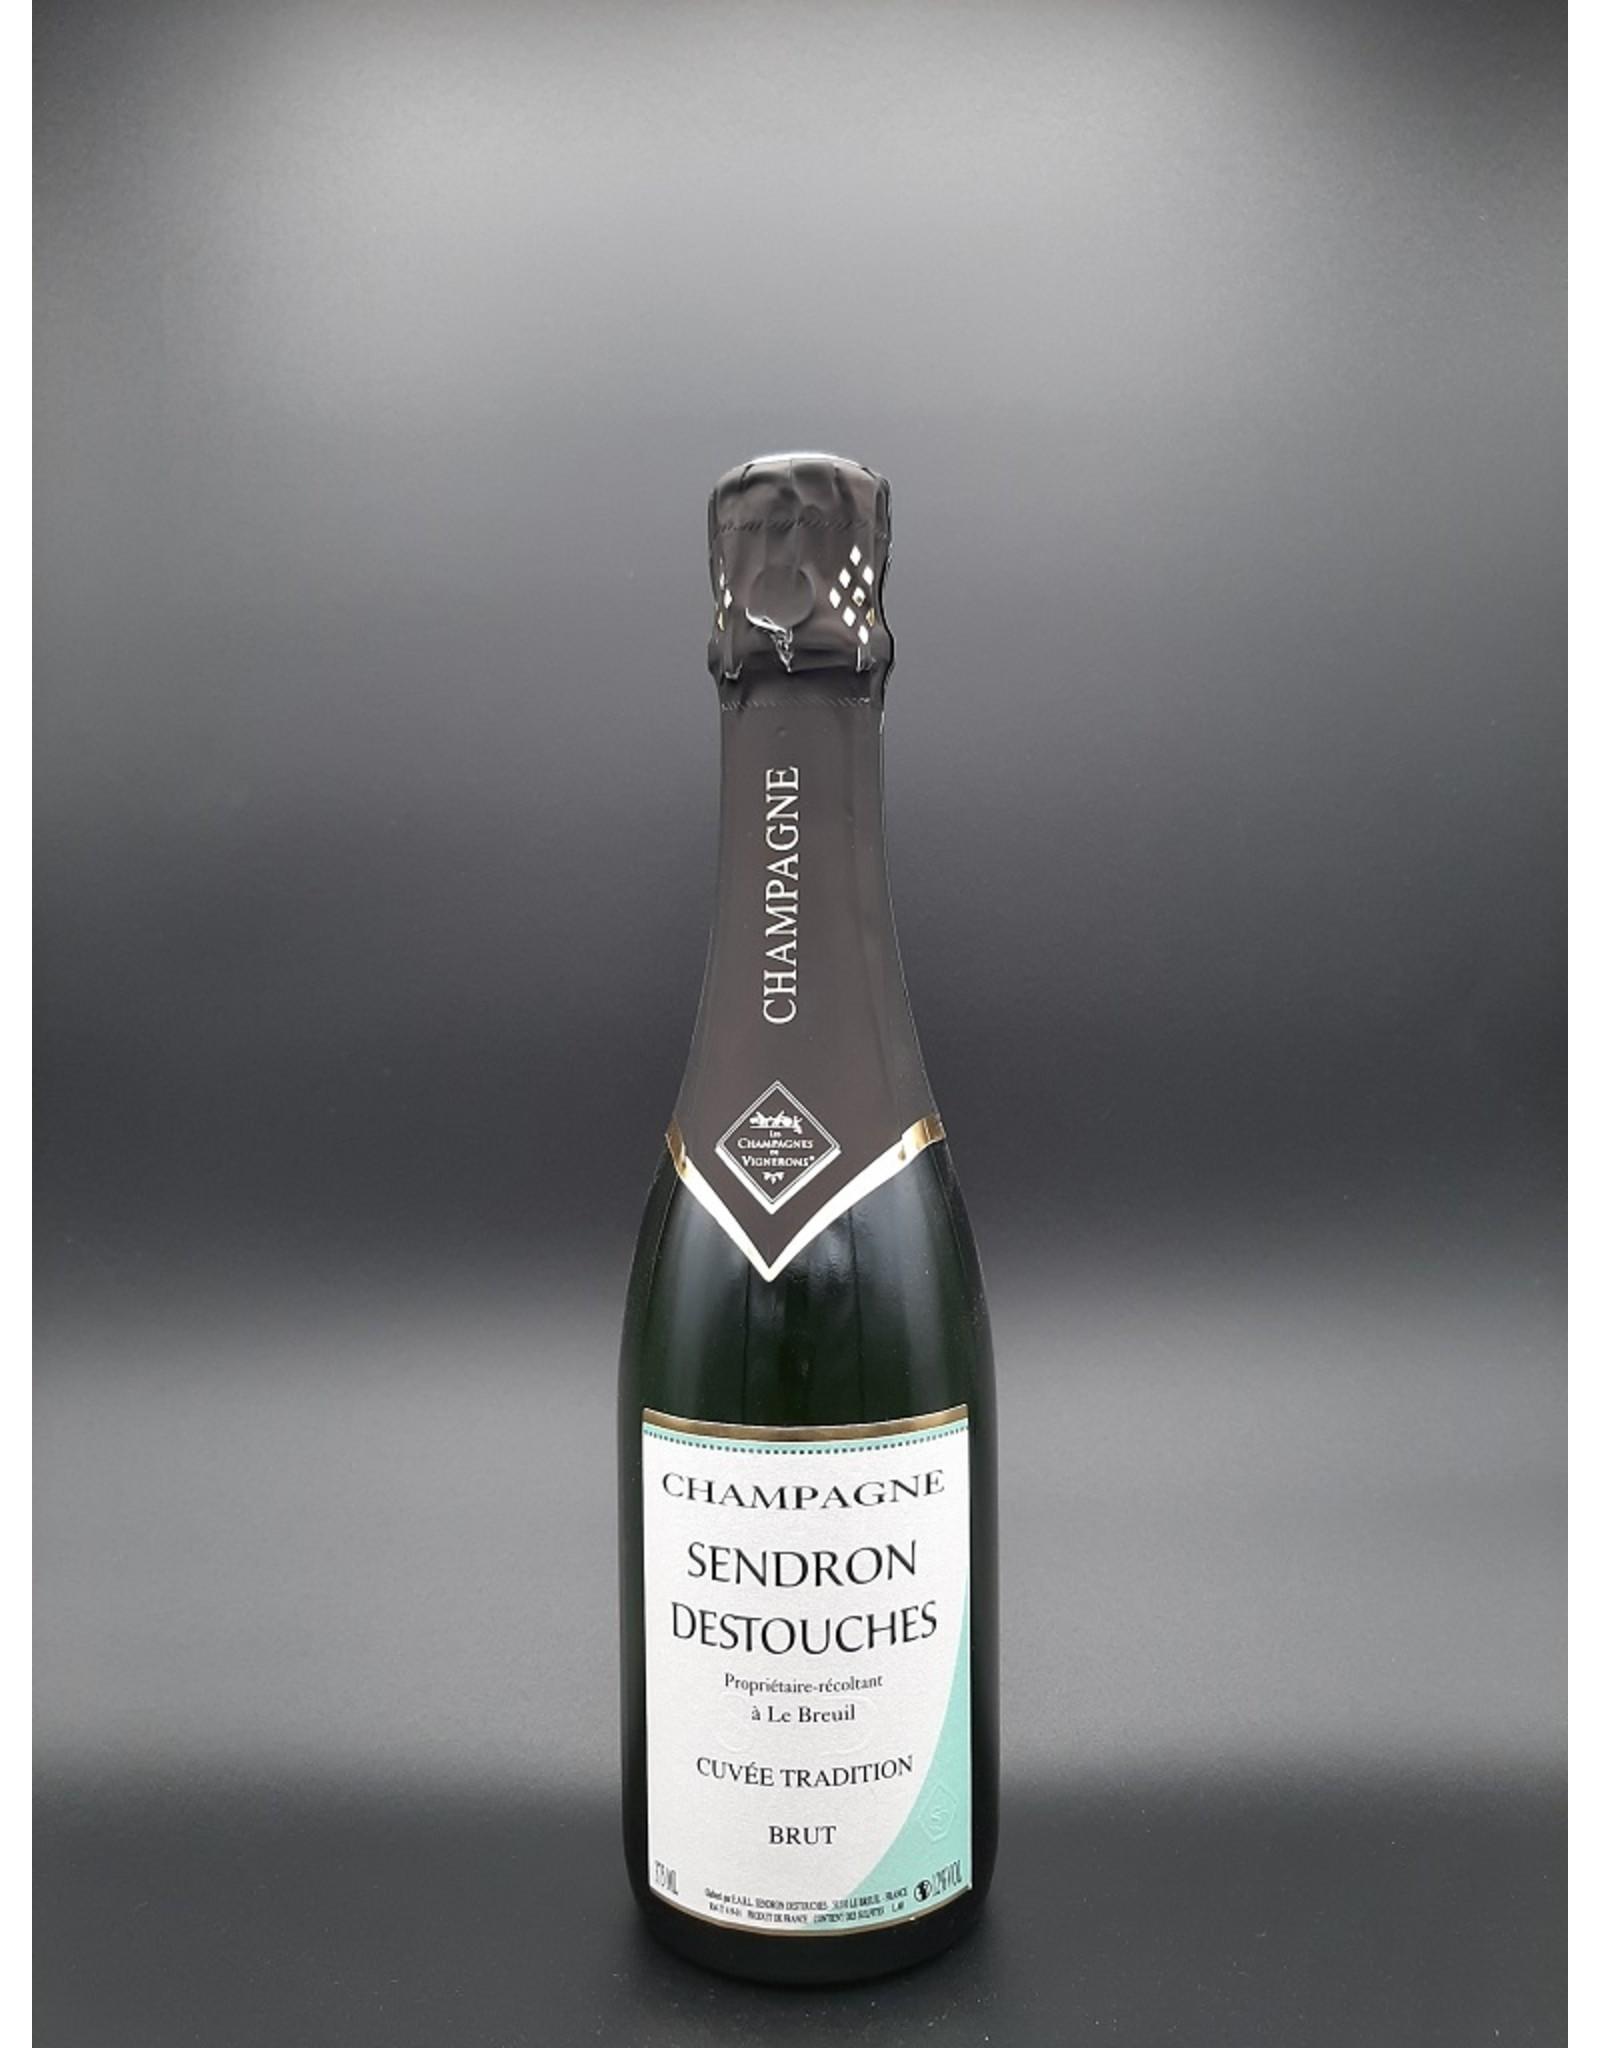 Champagne Sendron-Destouches Champagne cuvée Tradition Brut 37,5cl